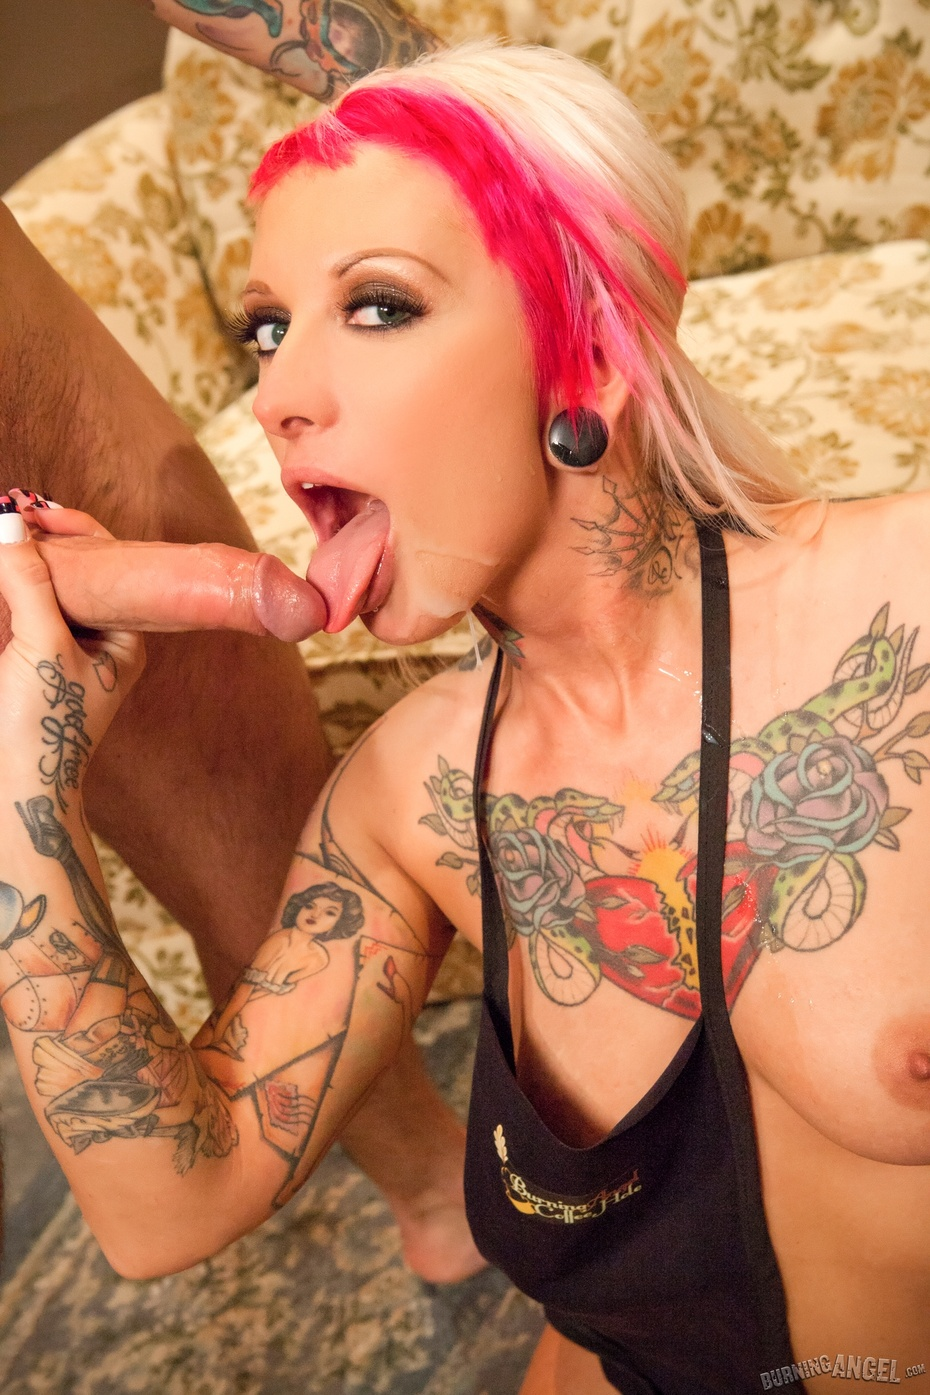 Actriz Porno Tatuajes De Estrellas Encima De Pechos top 10 pornstars tatuadas - poringa!